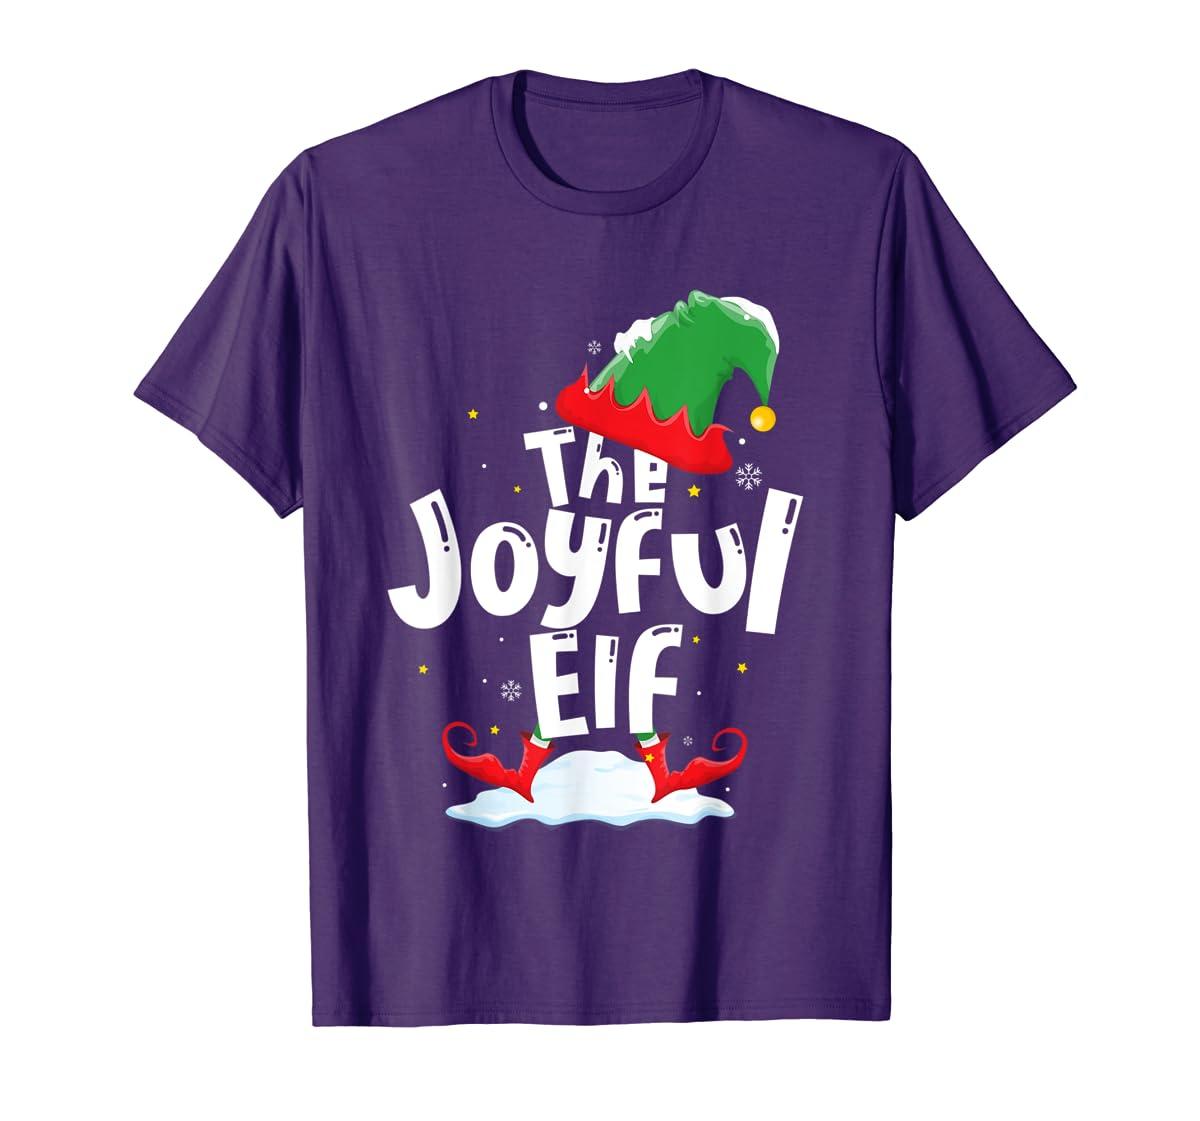 The Joyful Elf Group Matching Family Christmas Gifts Holiday T-Shirt-Men's T-Shirt-Purple